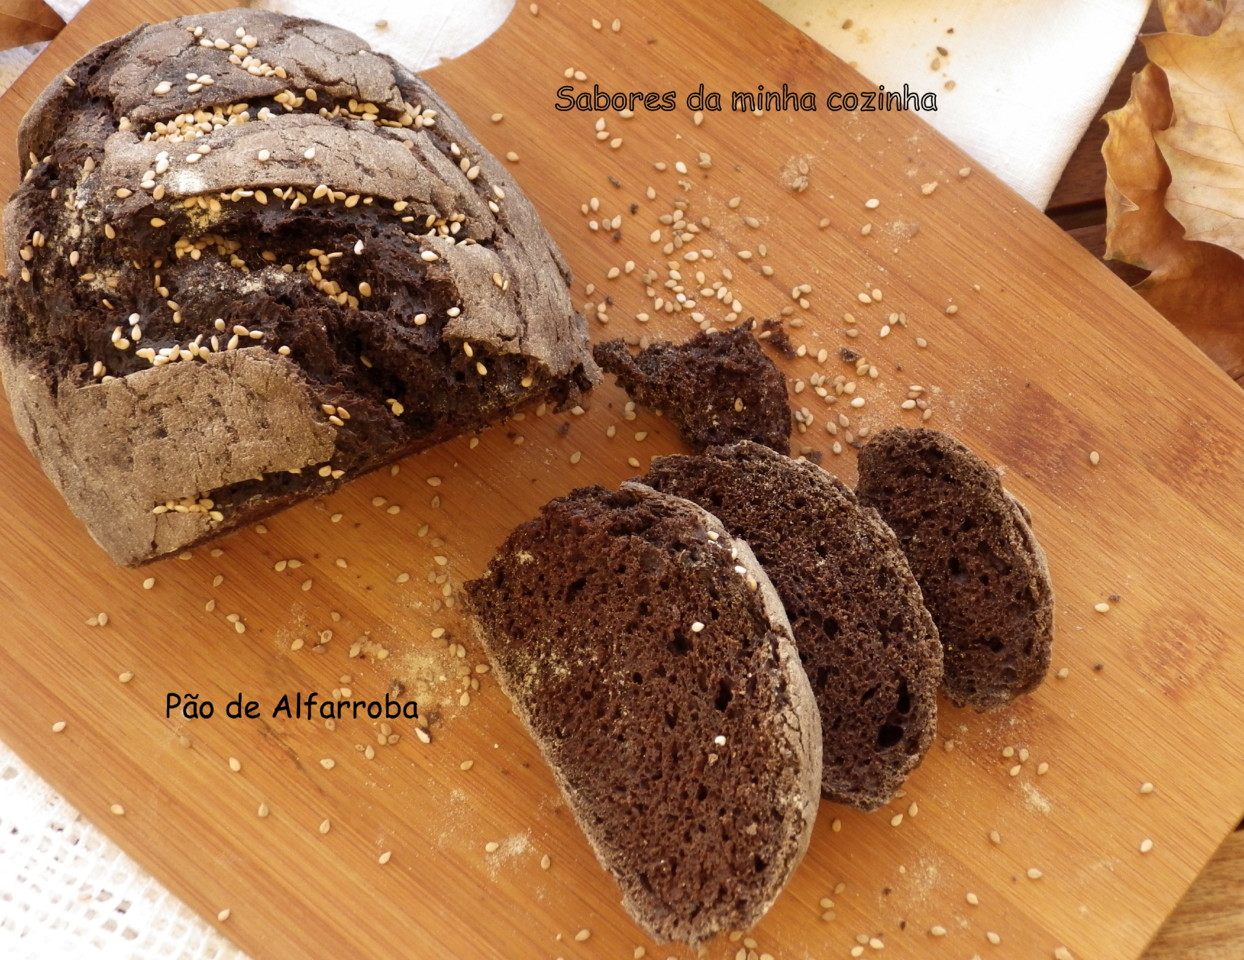 IMGP8738-Pão de alfarroba-Blog.JPG